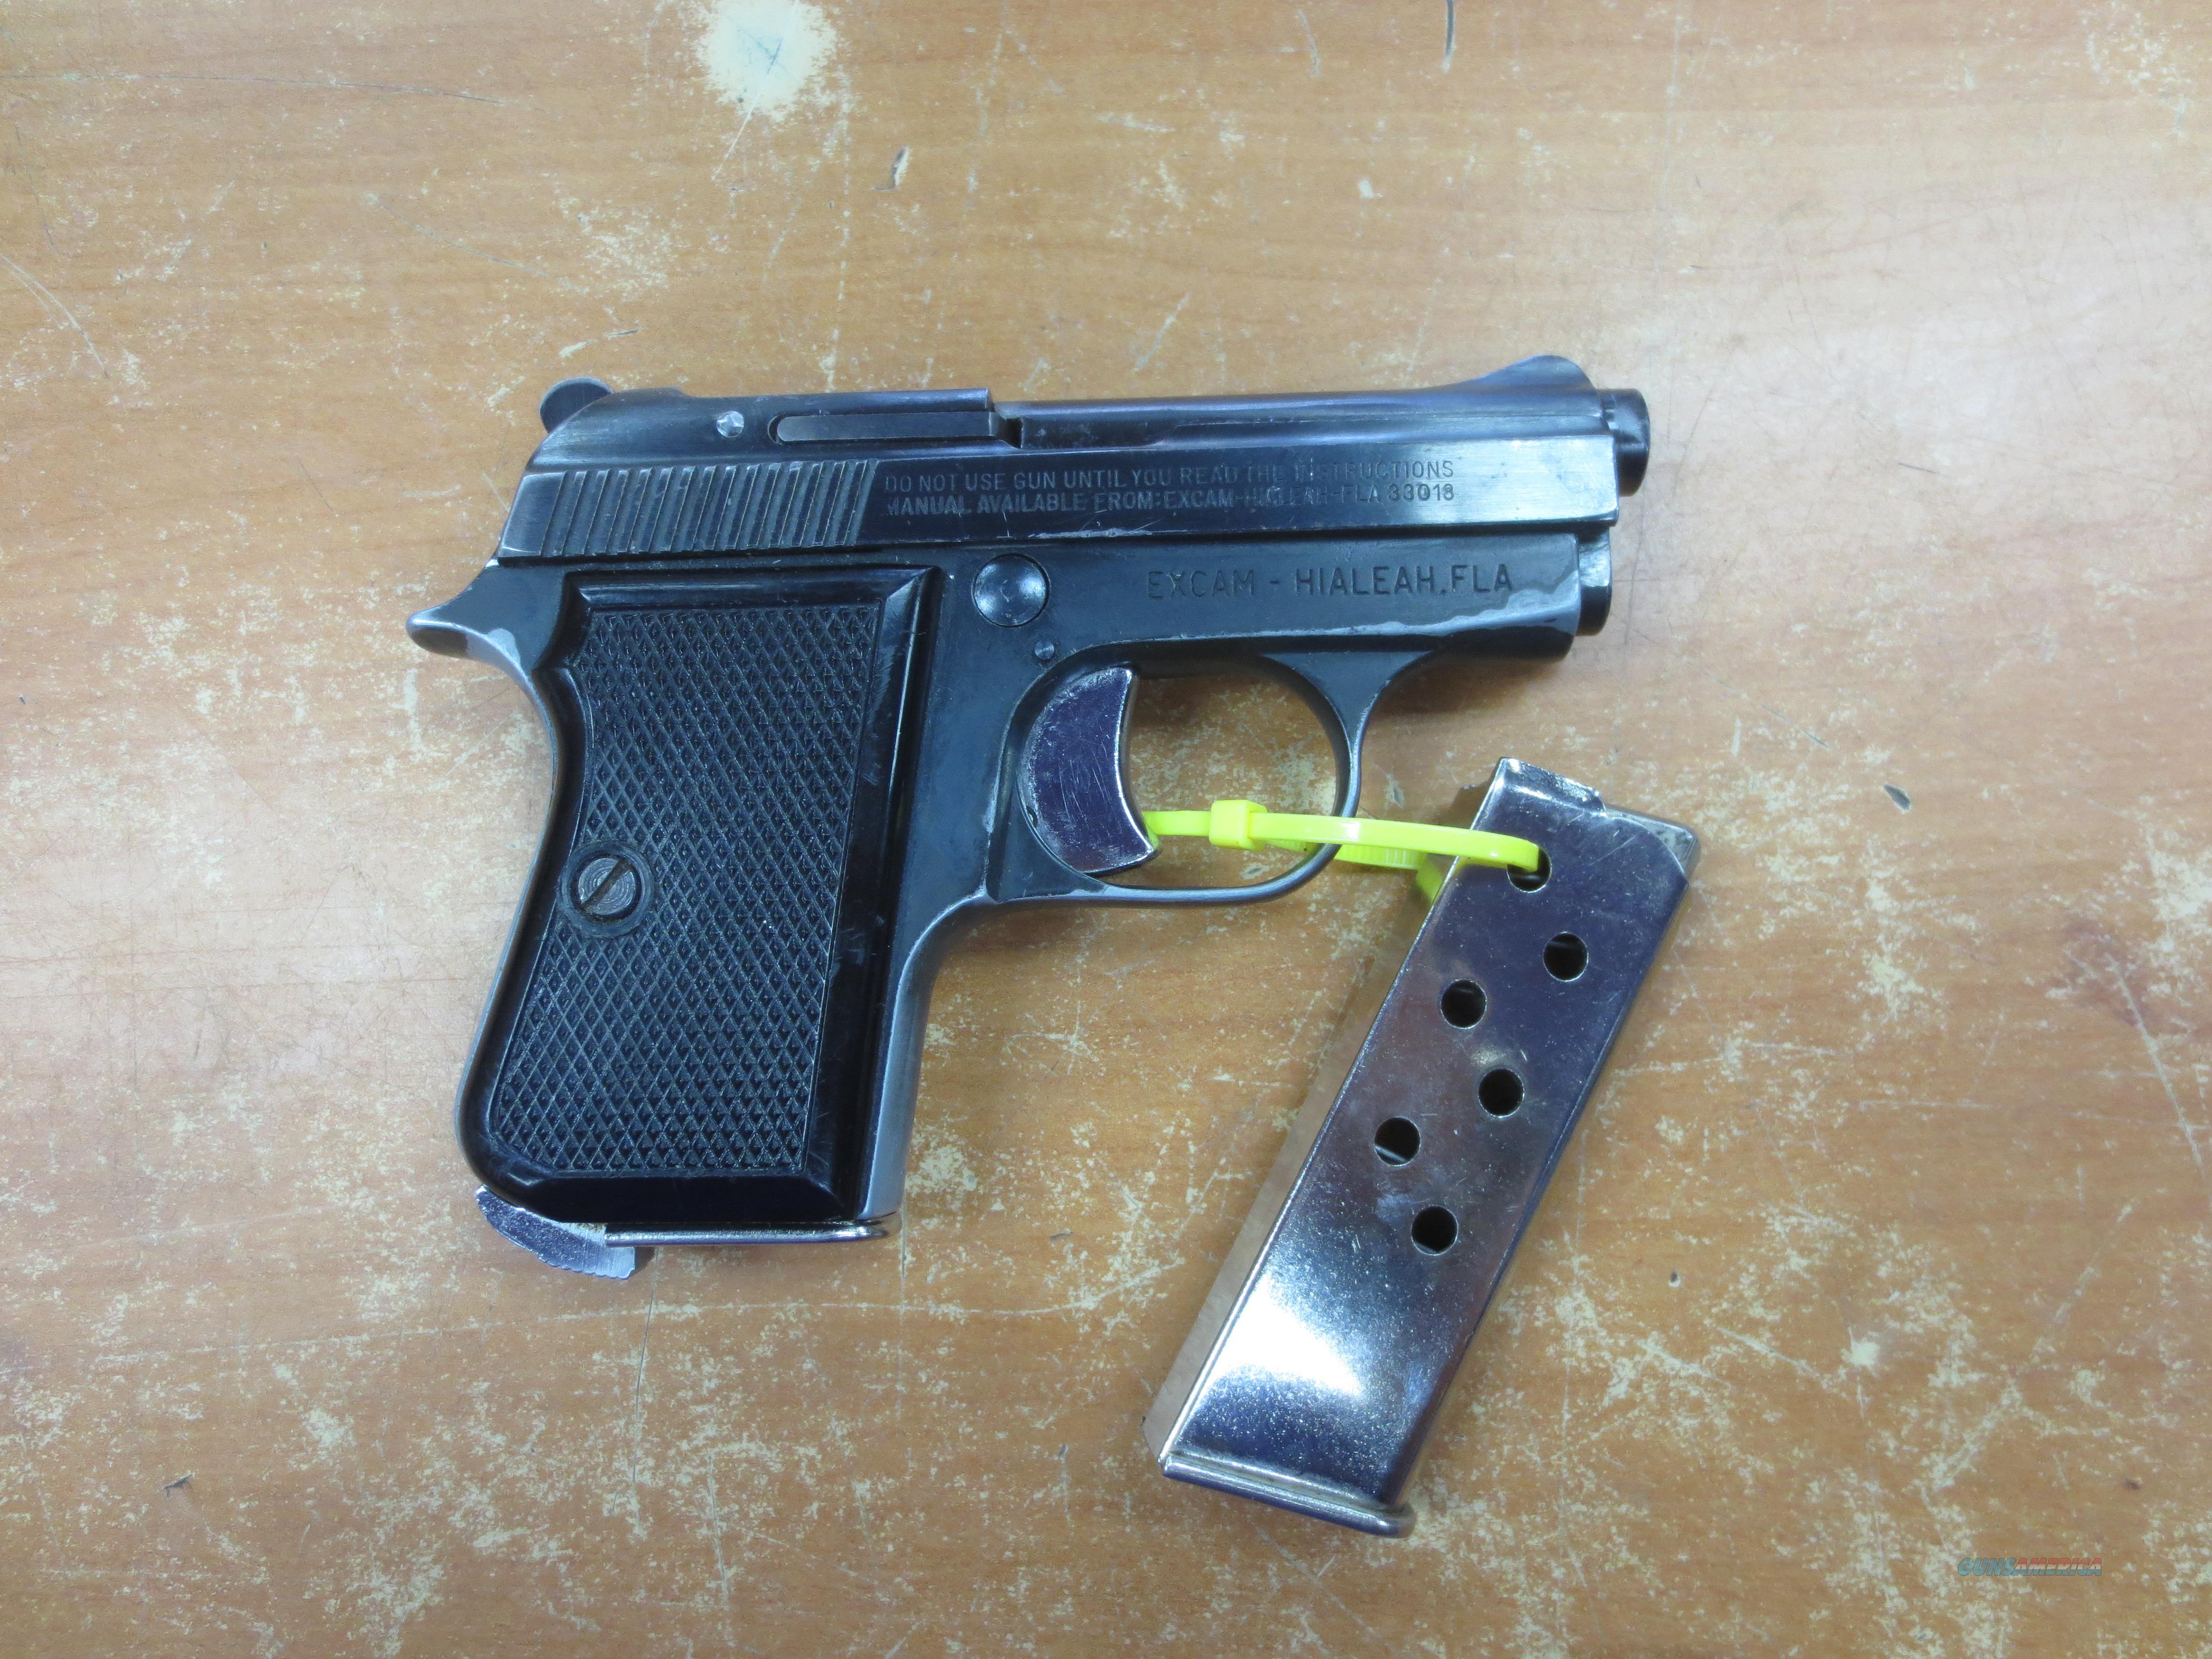 Armi Tanfoglio Giuseppe model GT27 Pocket Pistol .25 cal  Guns > Pistols > A Misc Pistols